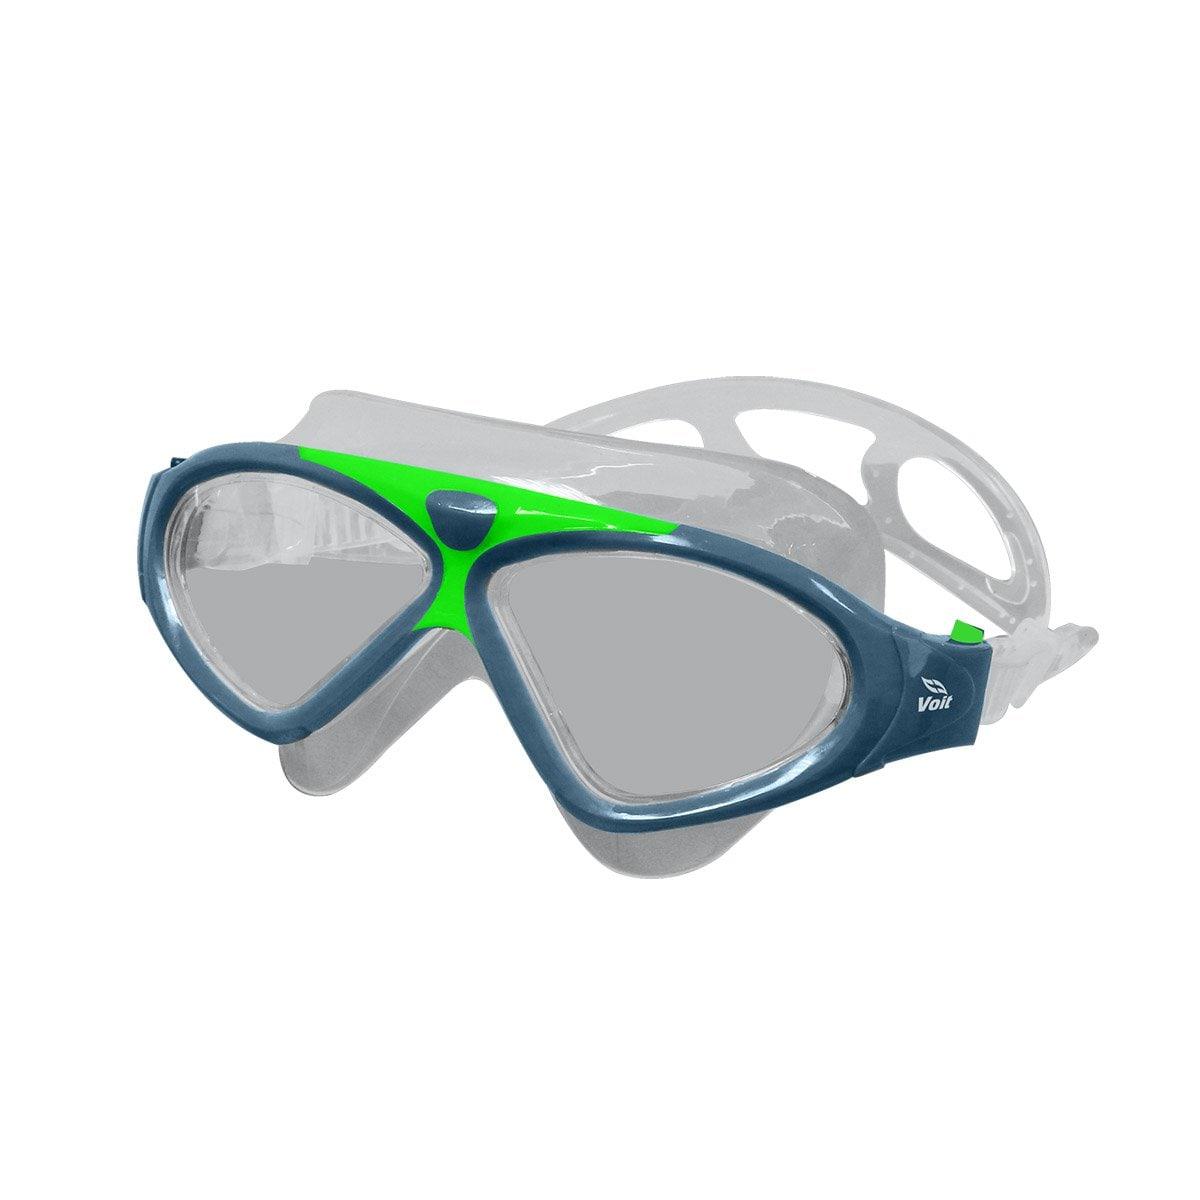 Goggles Ultra Verdes Voit